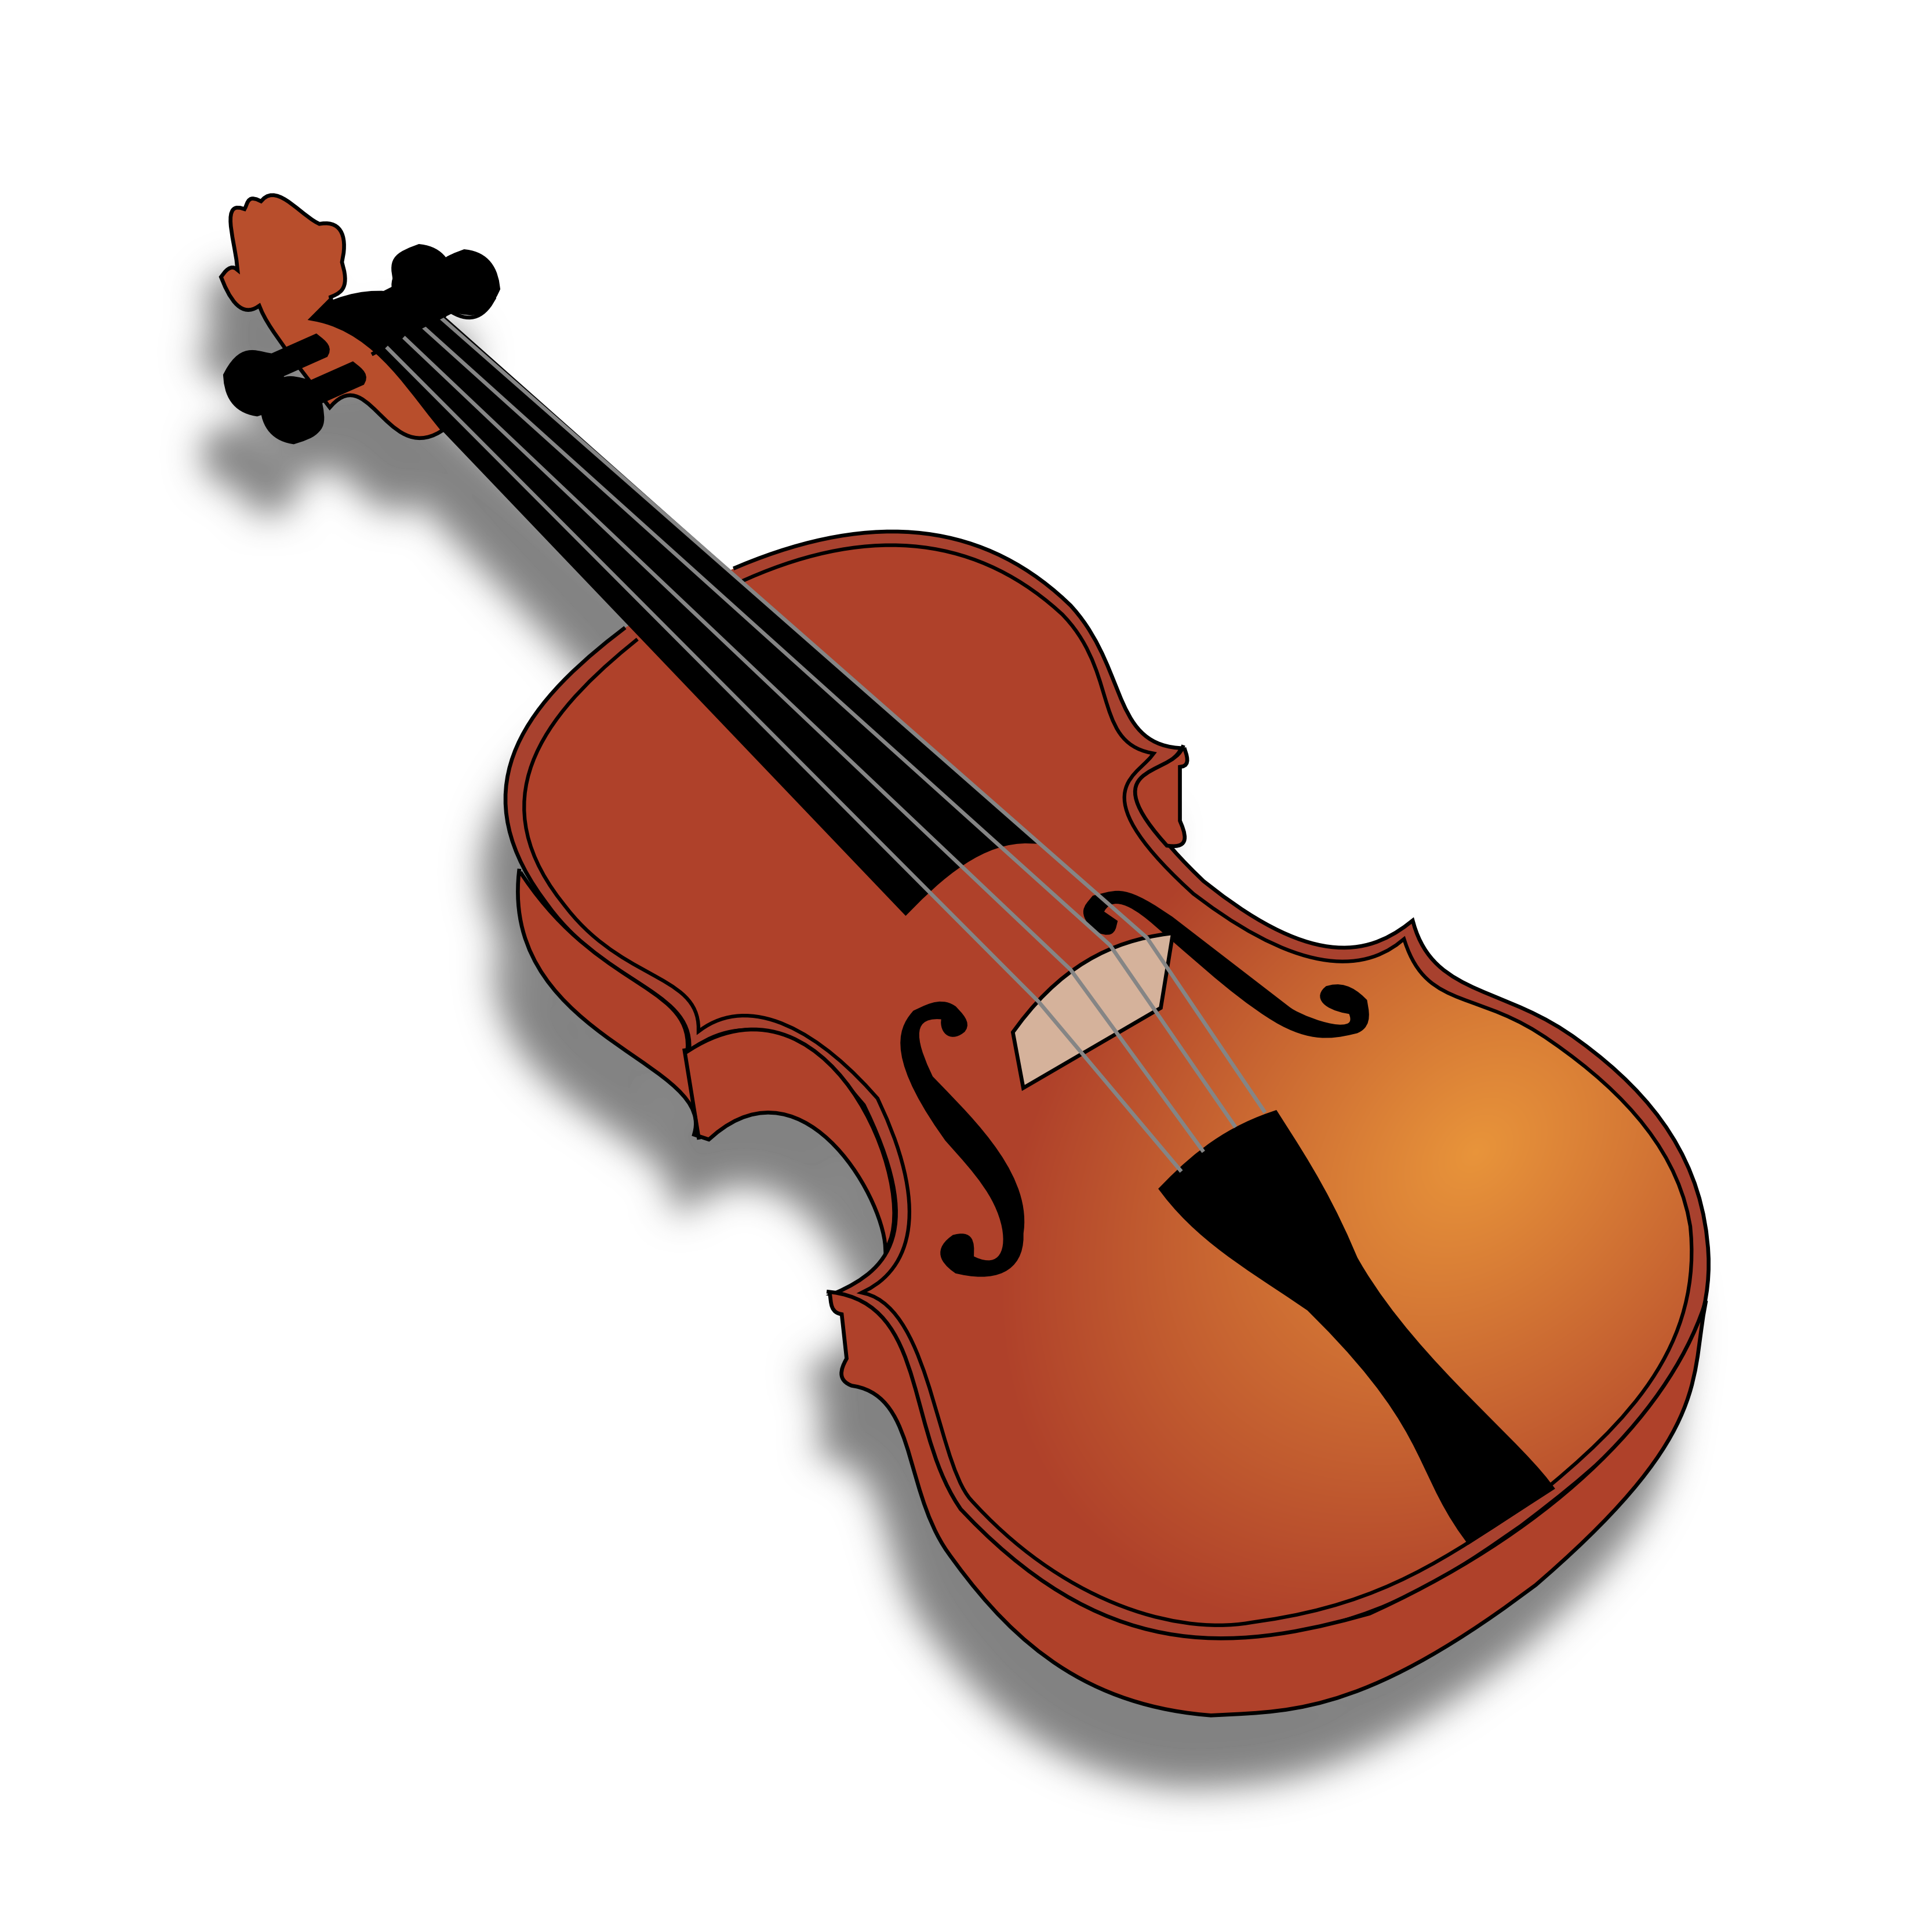 violin clip art free clipart panda free clipart images rh clipartpanda com violin clipart png violin clip art black and white